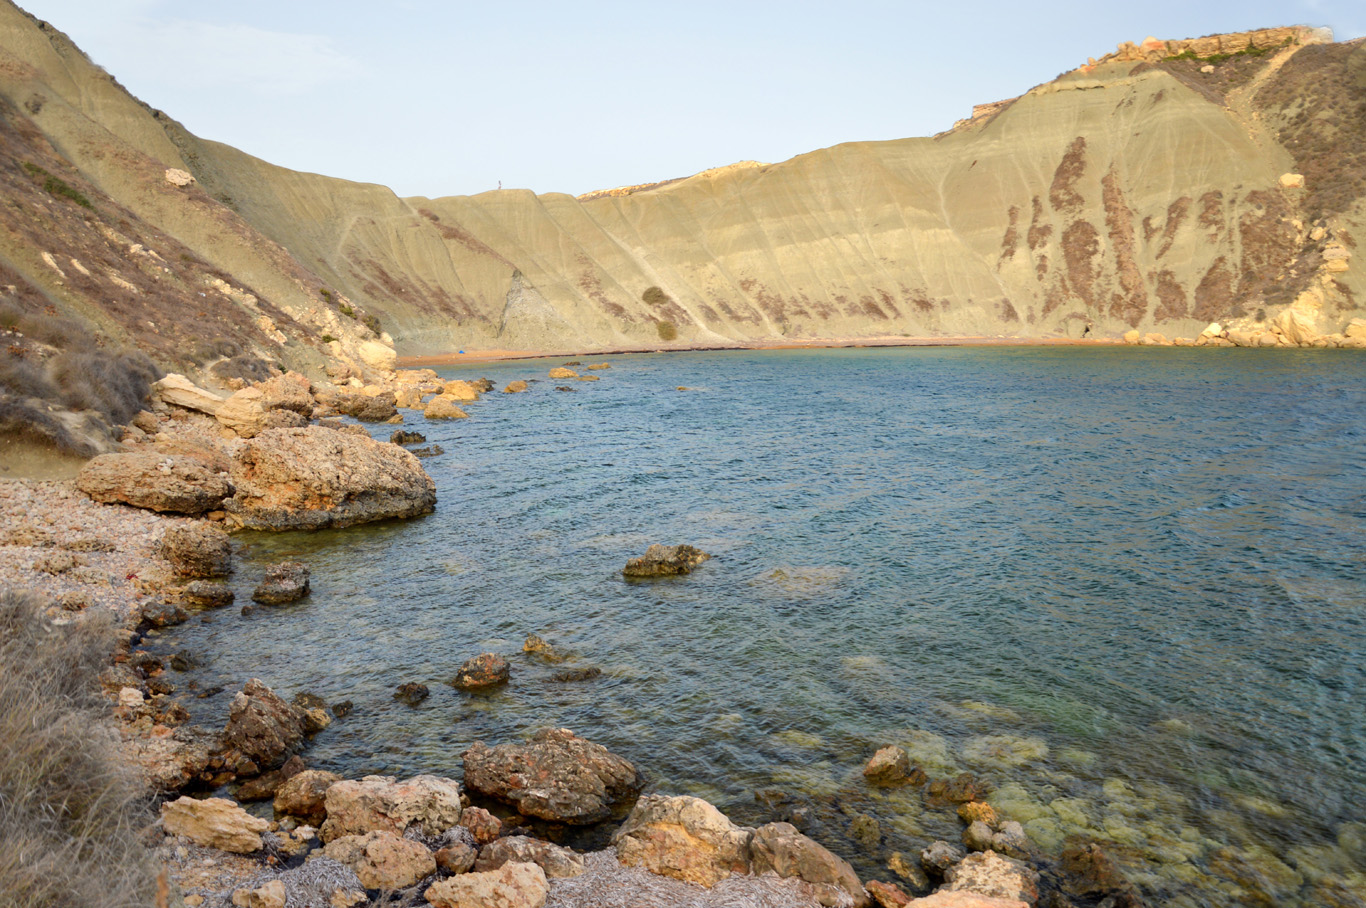 The quiet beach and the barren hills